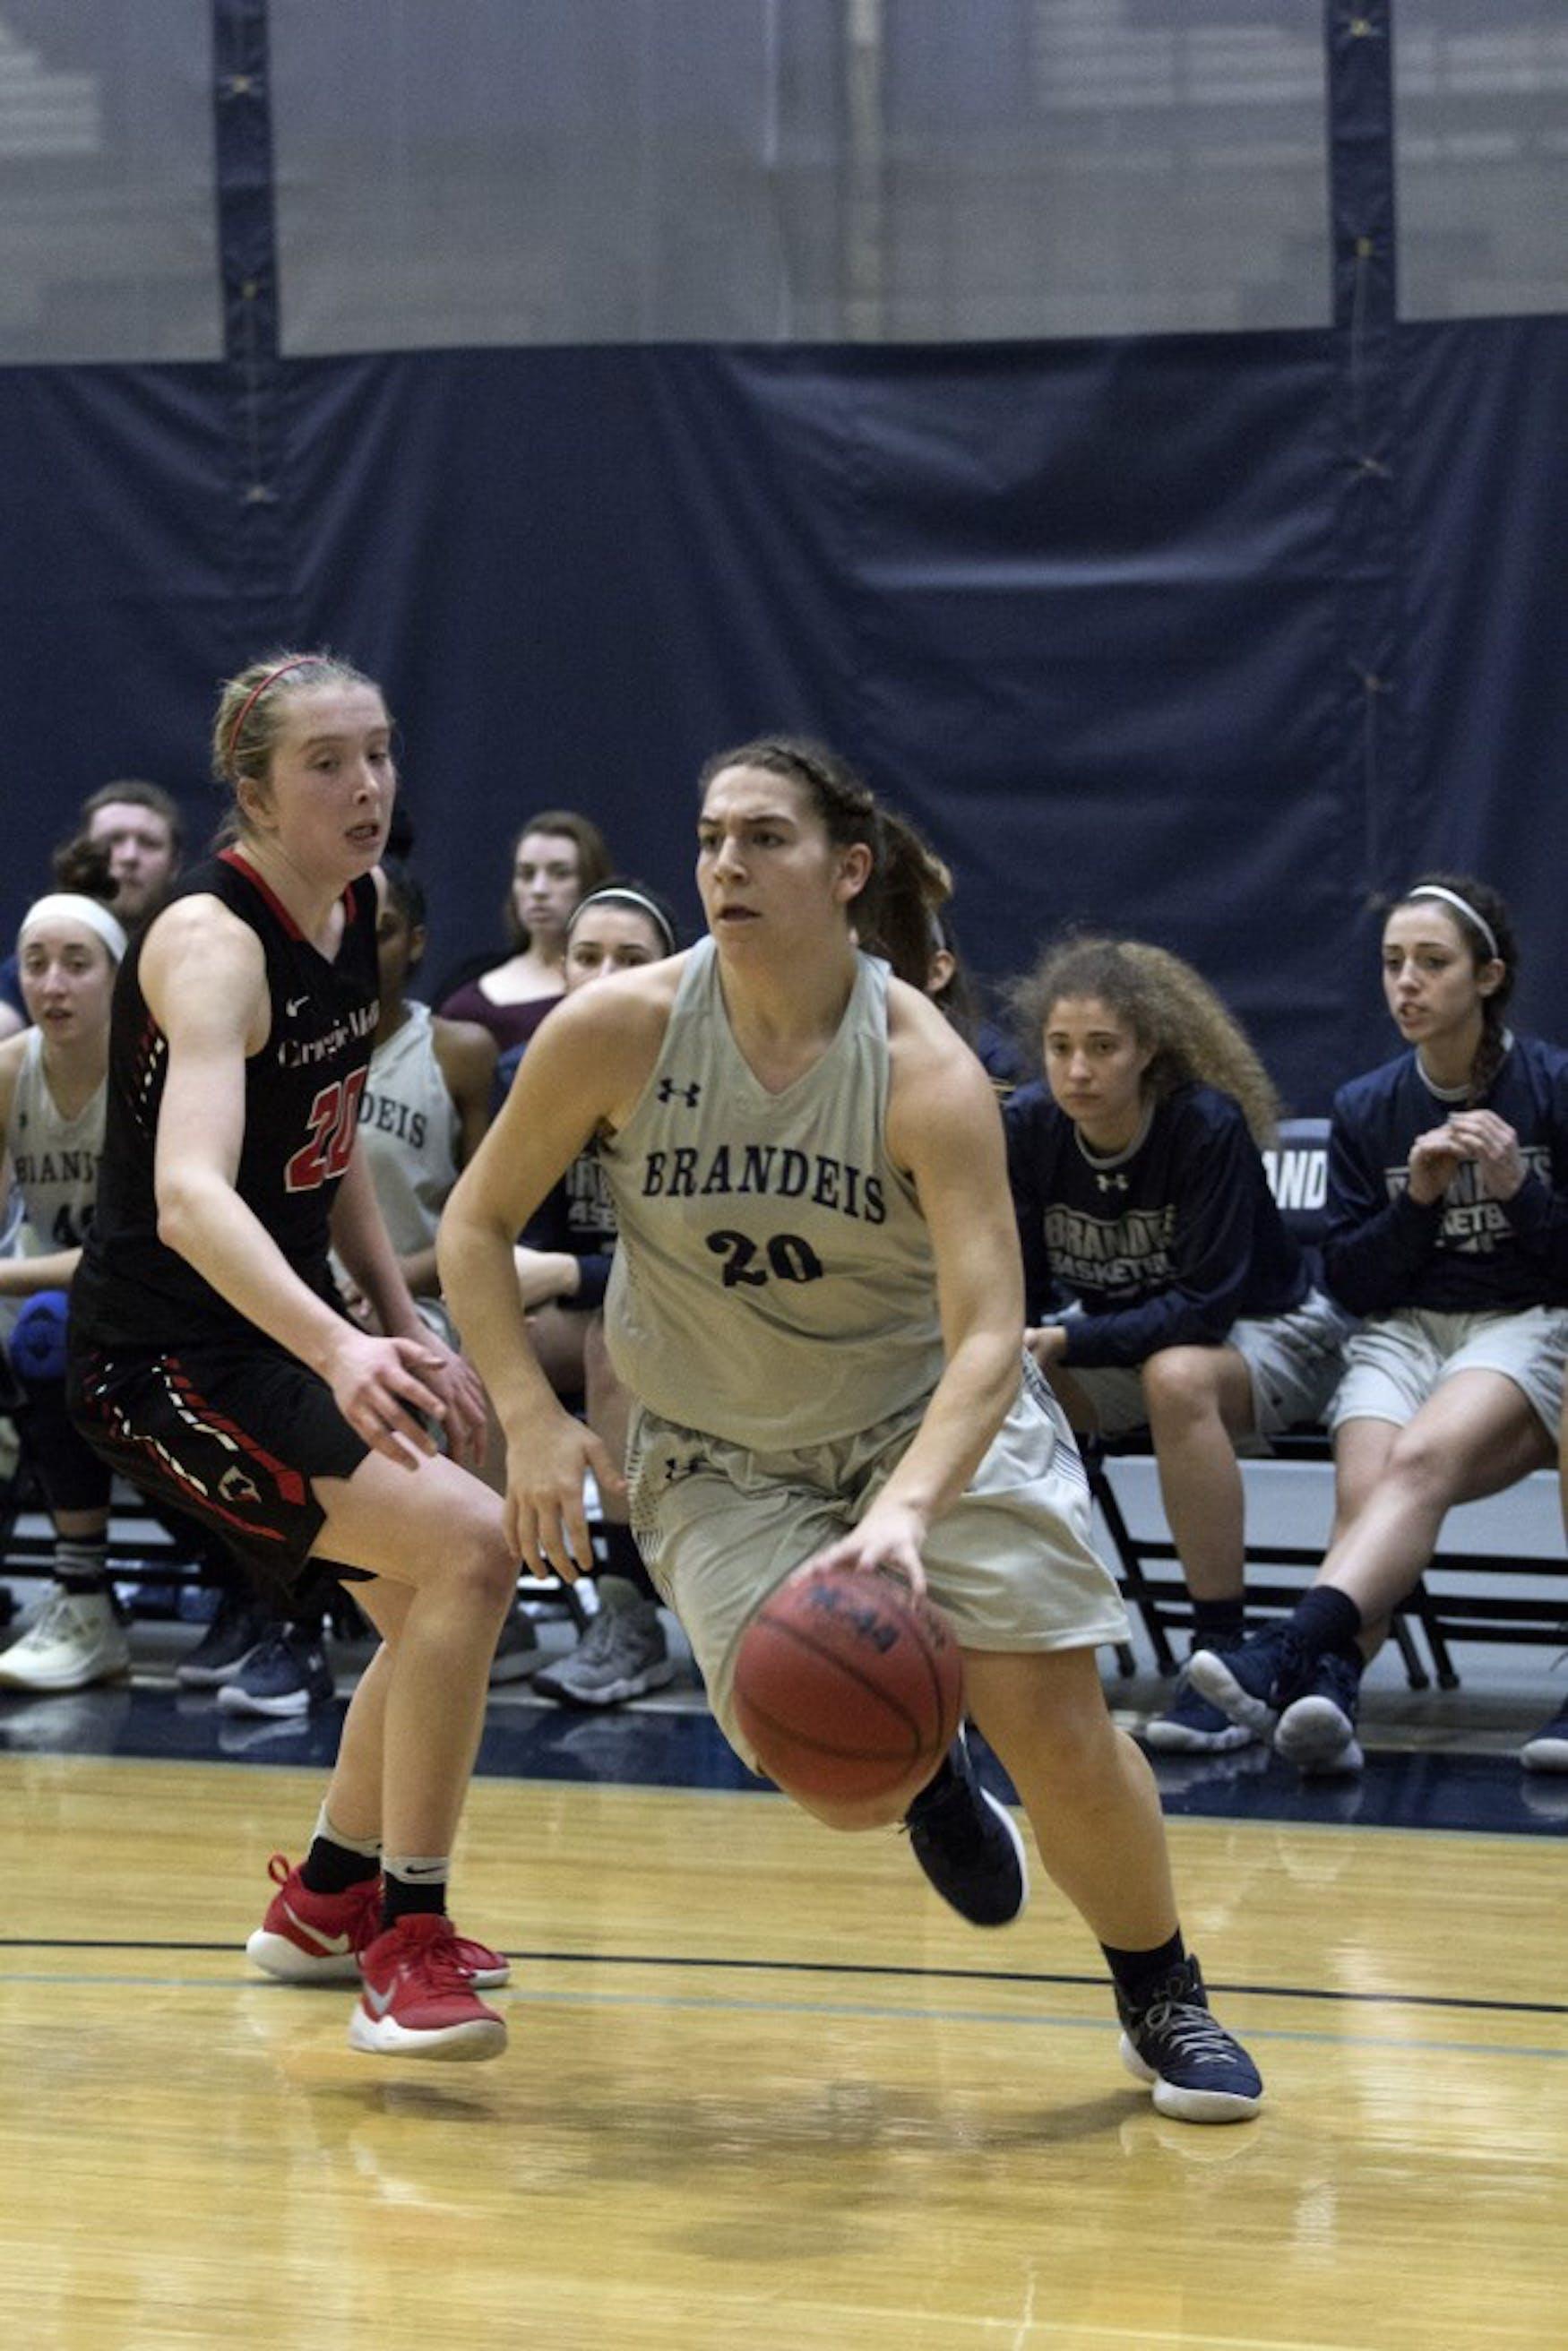 womens-basketball-vs-carnegie-1-28-18-ys1-0424